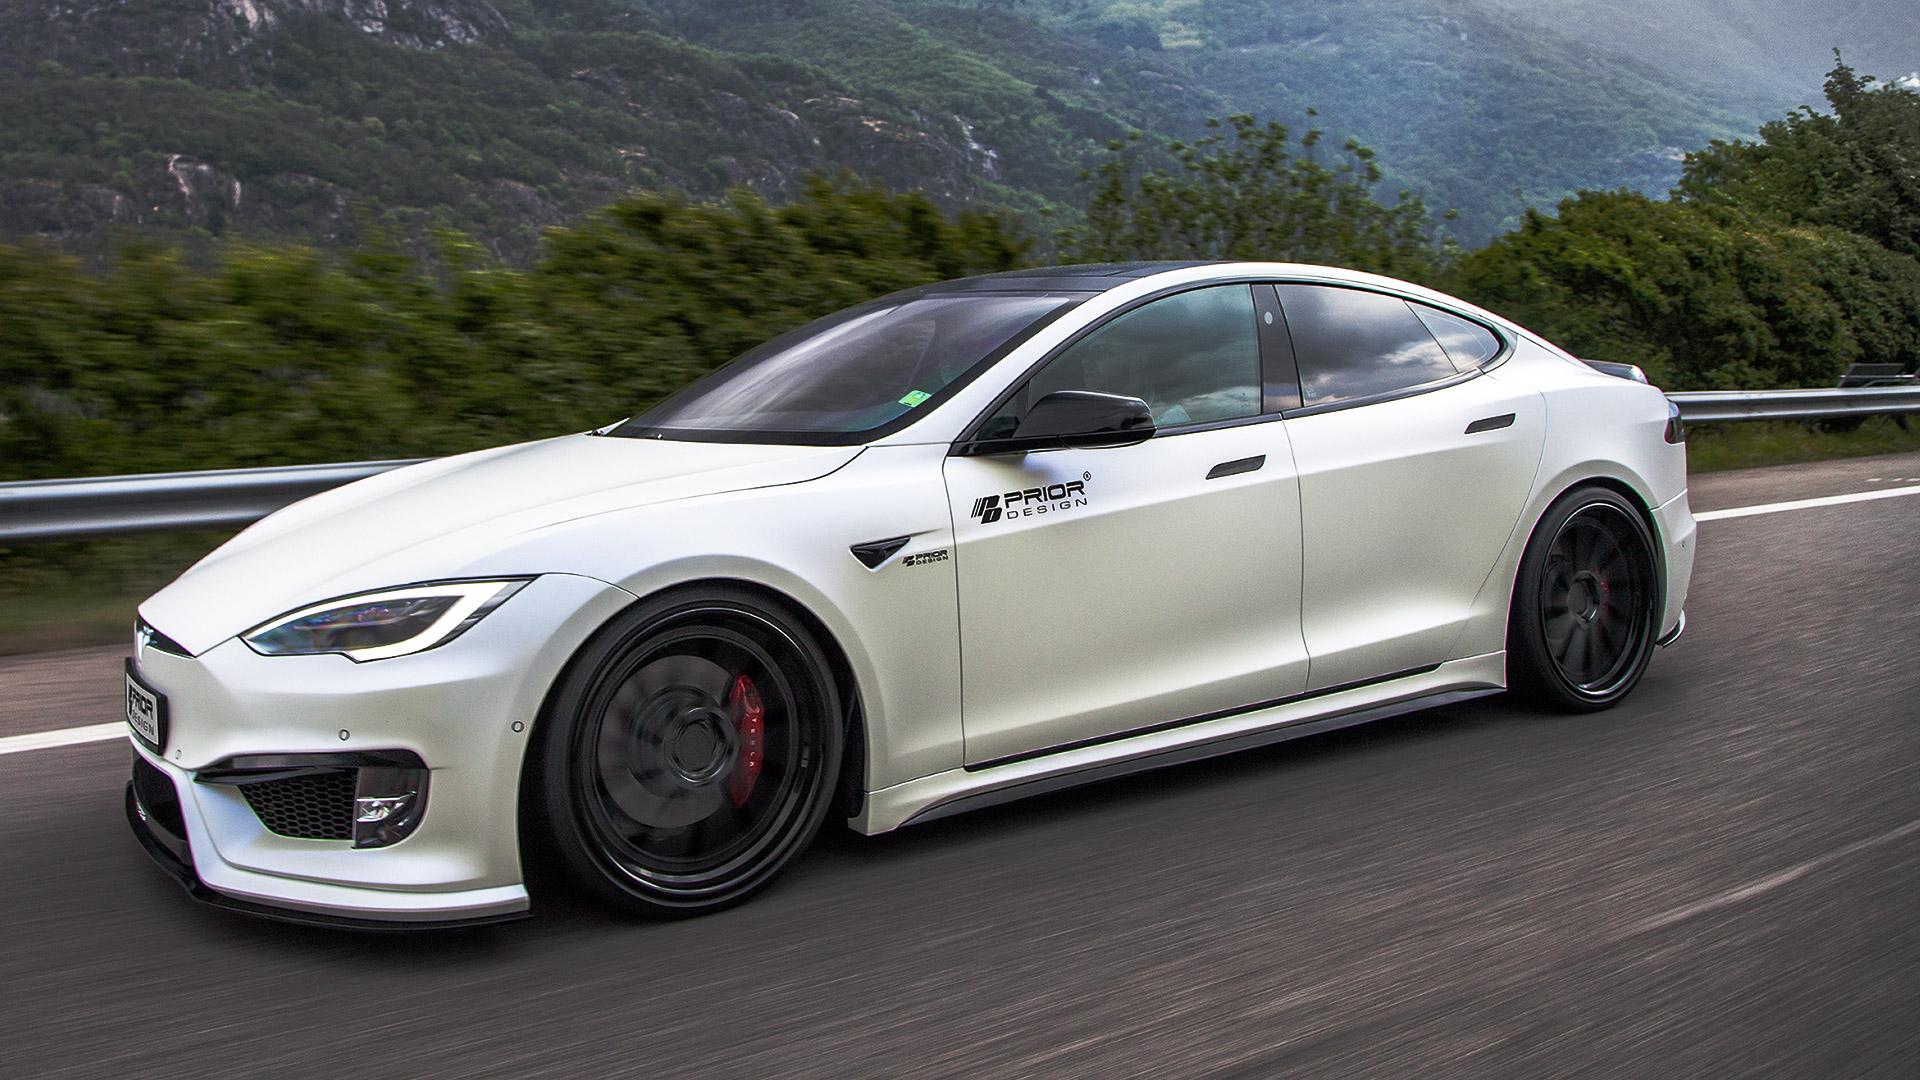 Body Kit For Tesla Model S 2016